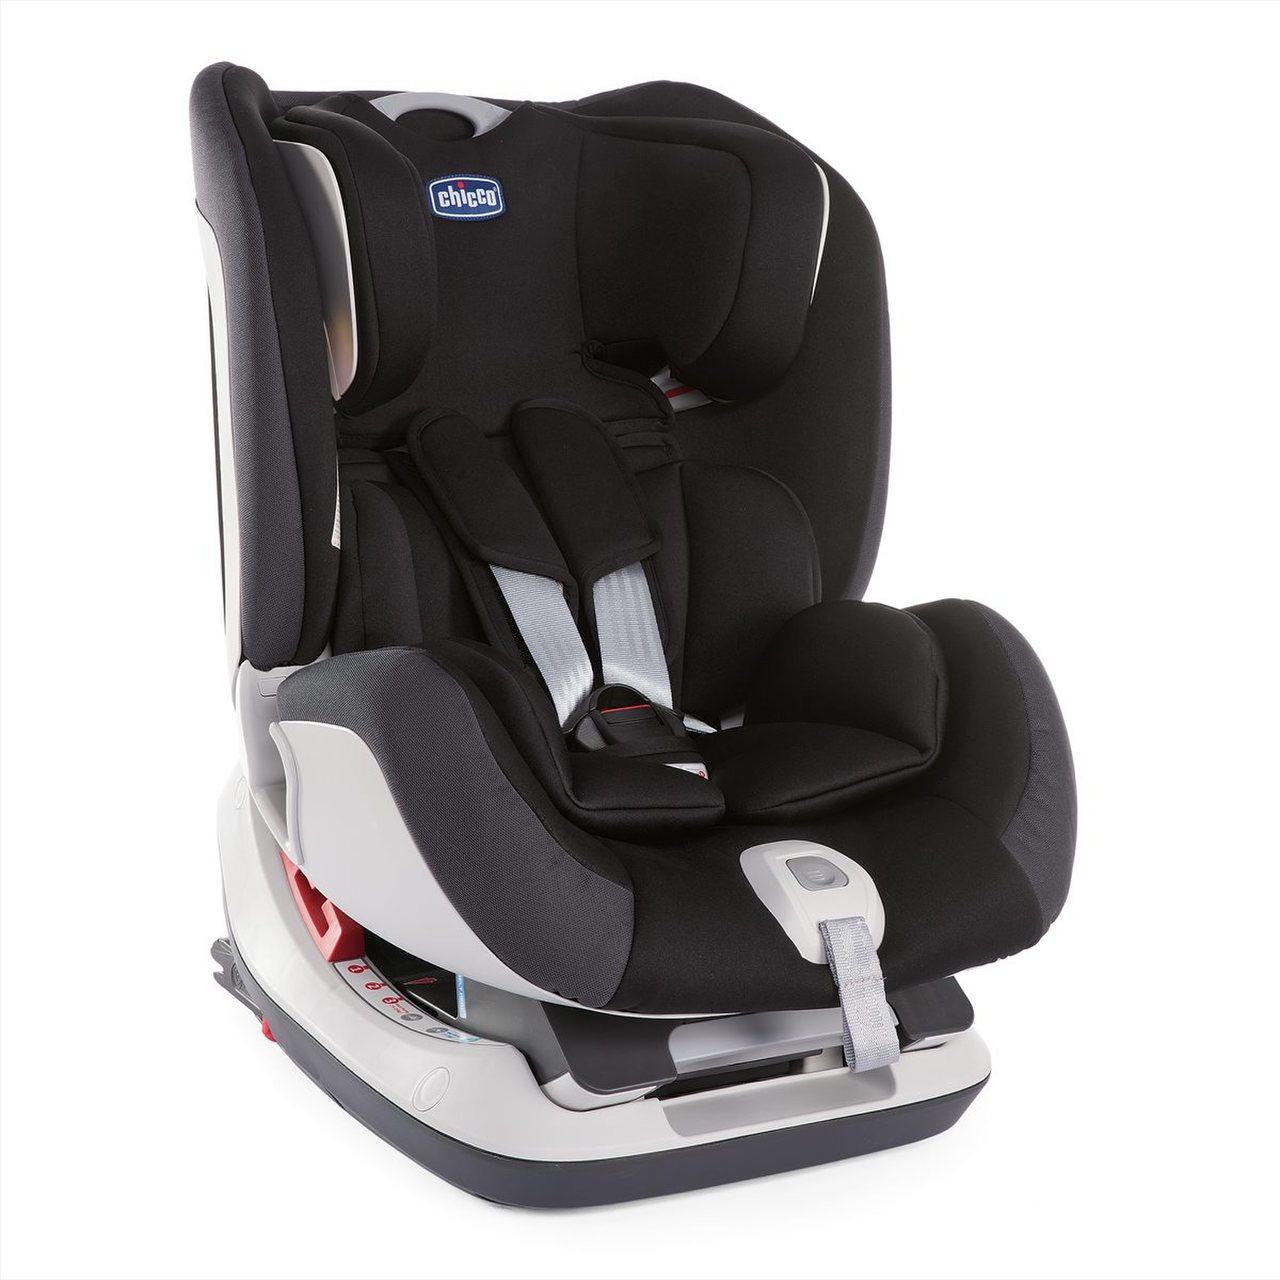 Фото - Автокресло Chicco Seat-up JET BLACK (+ Солнцезащитные шторки в подарок!) автокресло группа 0 1 2 до 25 кг chicco seat up isofix pearl